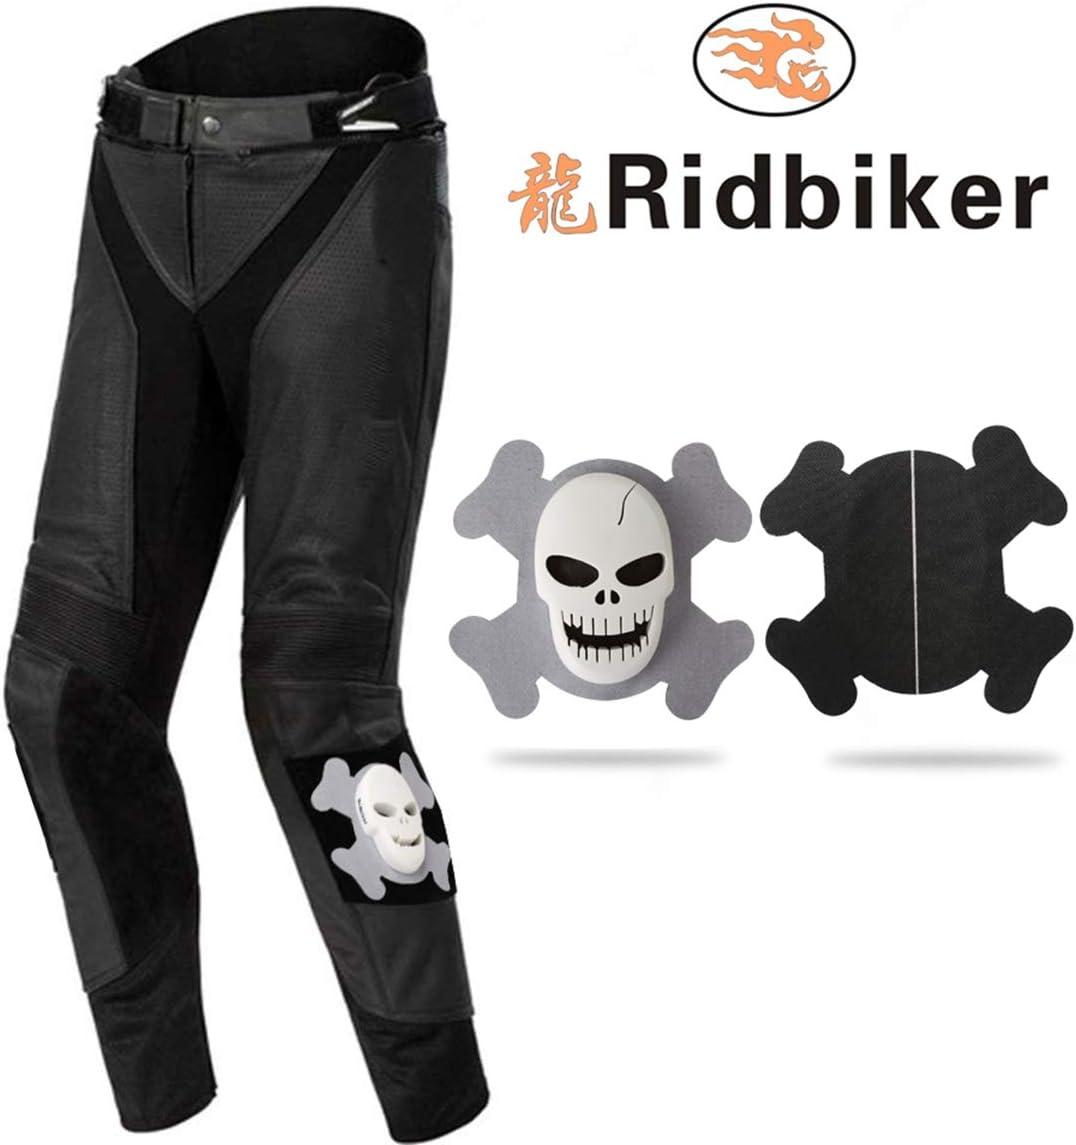 Ridbiker 2Pcs Knee Sliders Off-Road Motorcycle Hard Version,Skull Design,Gray